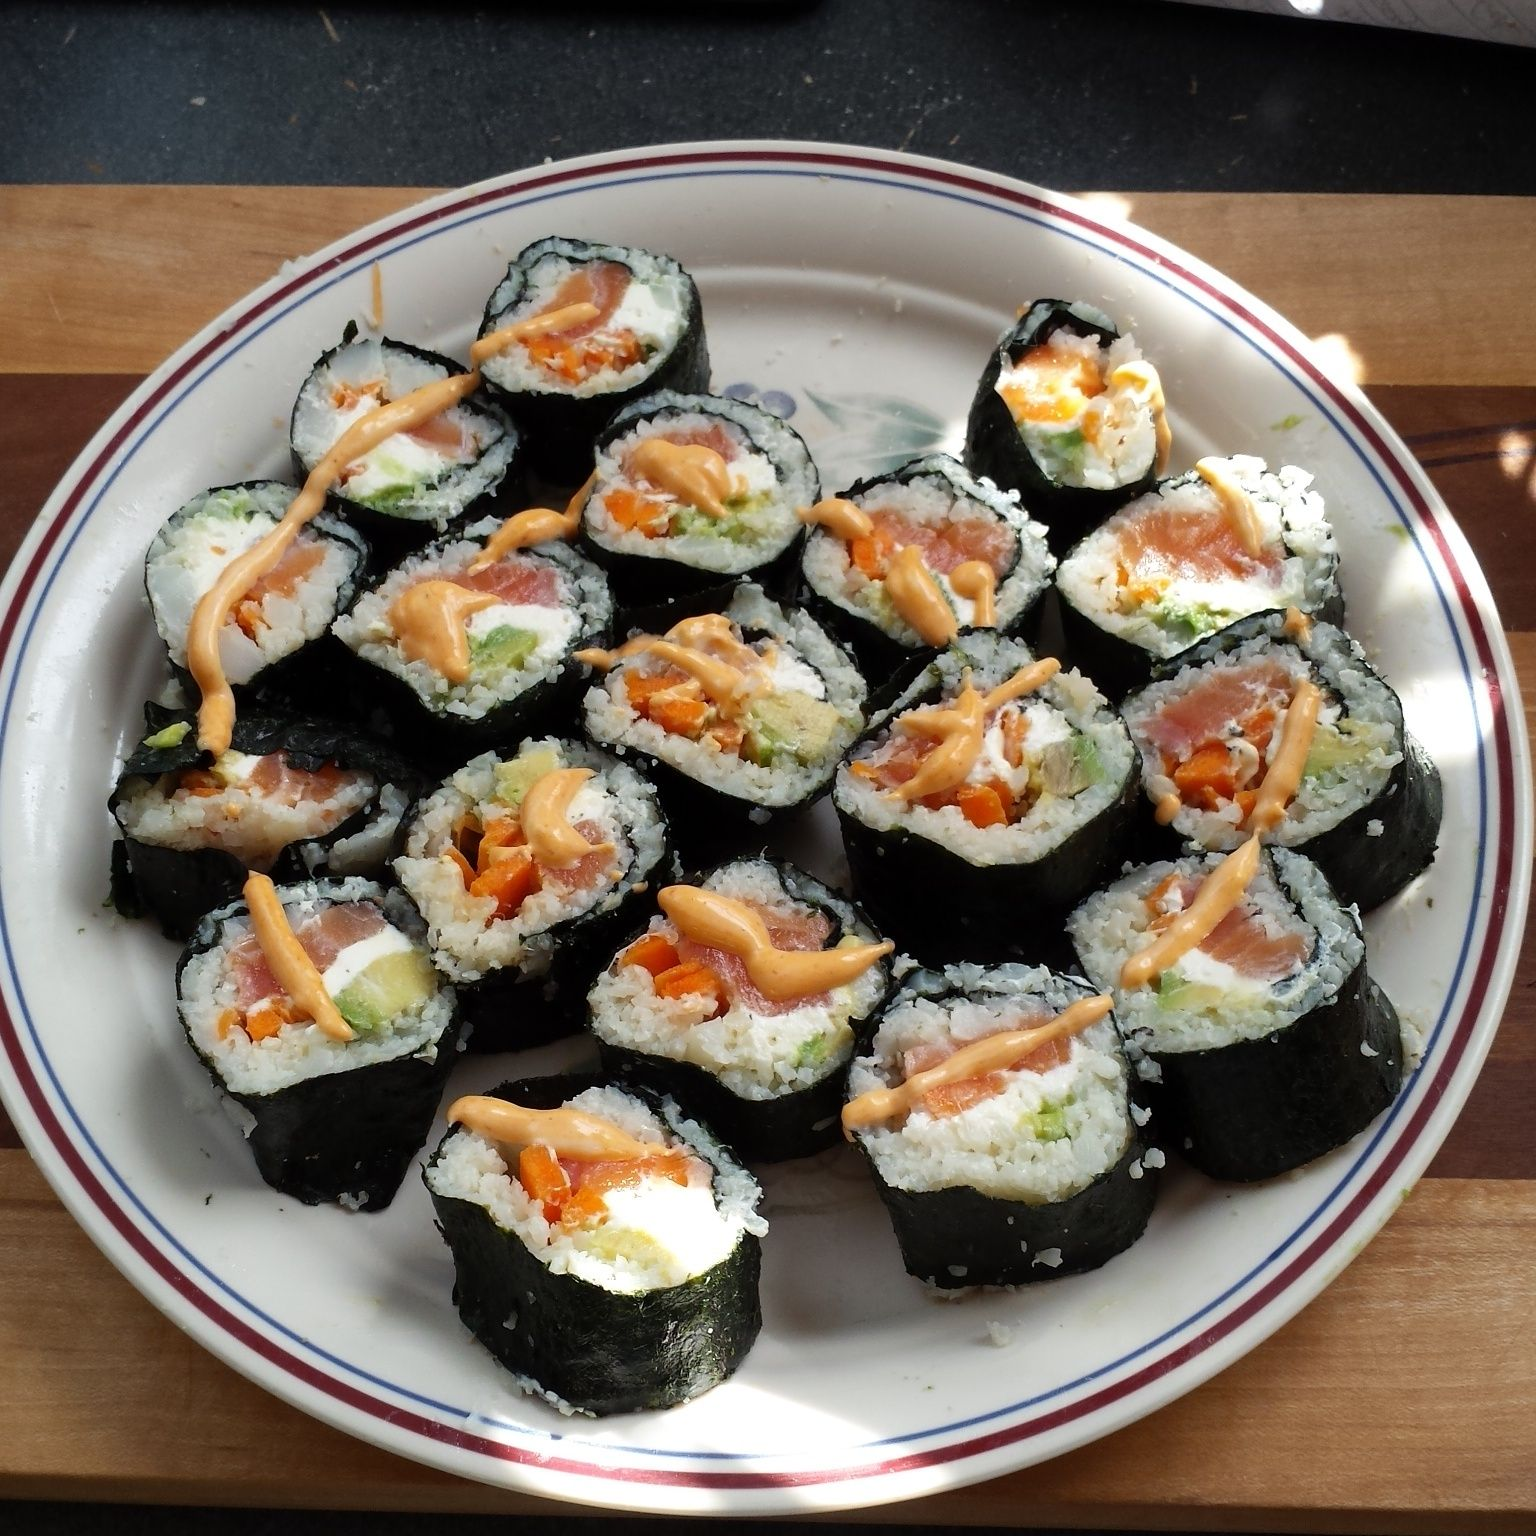 drag to resize or shift+drag to move Sushi rice, Sushi